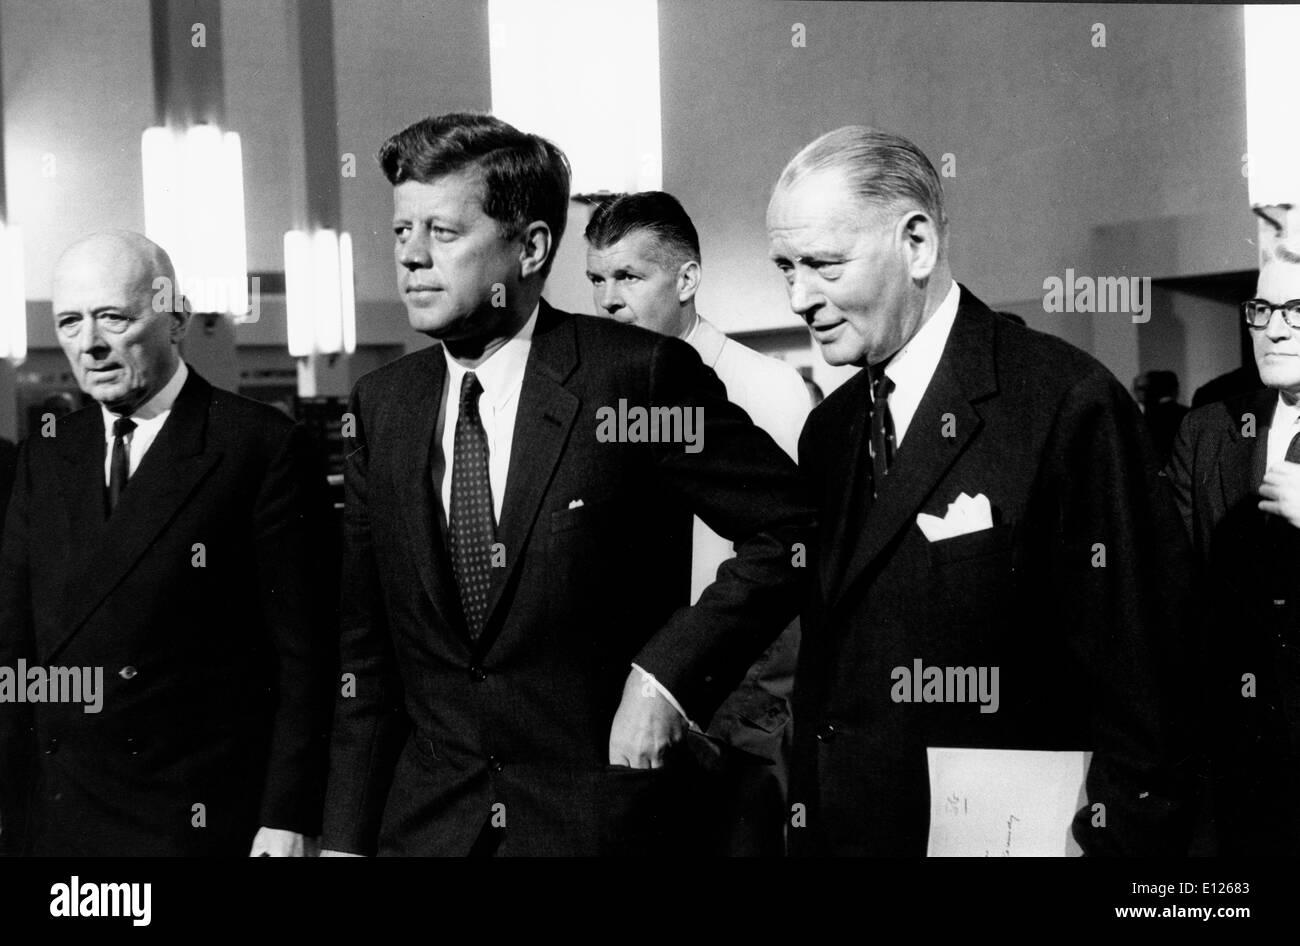 Aug 21, 2006; London, UK; JOHN FITZGERALD KENNEDY (May 29, 1917 Ð November 22, 1963), often referred to as John F. Kennedy, JFK - Stock Image